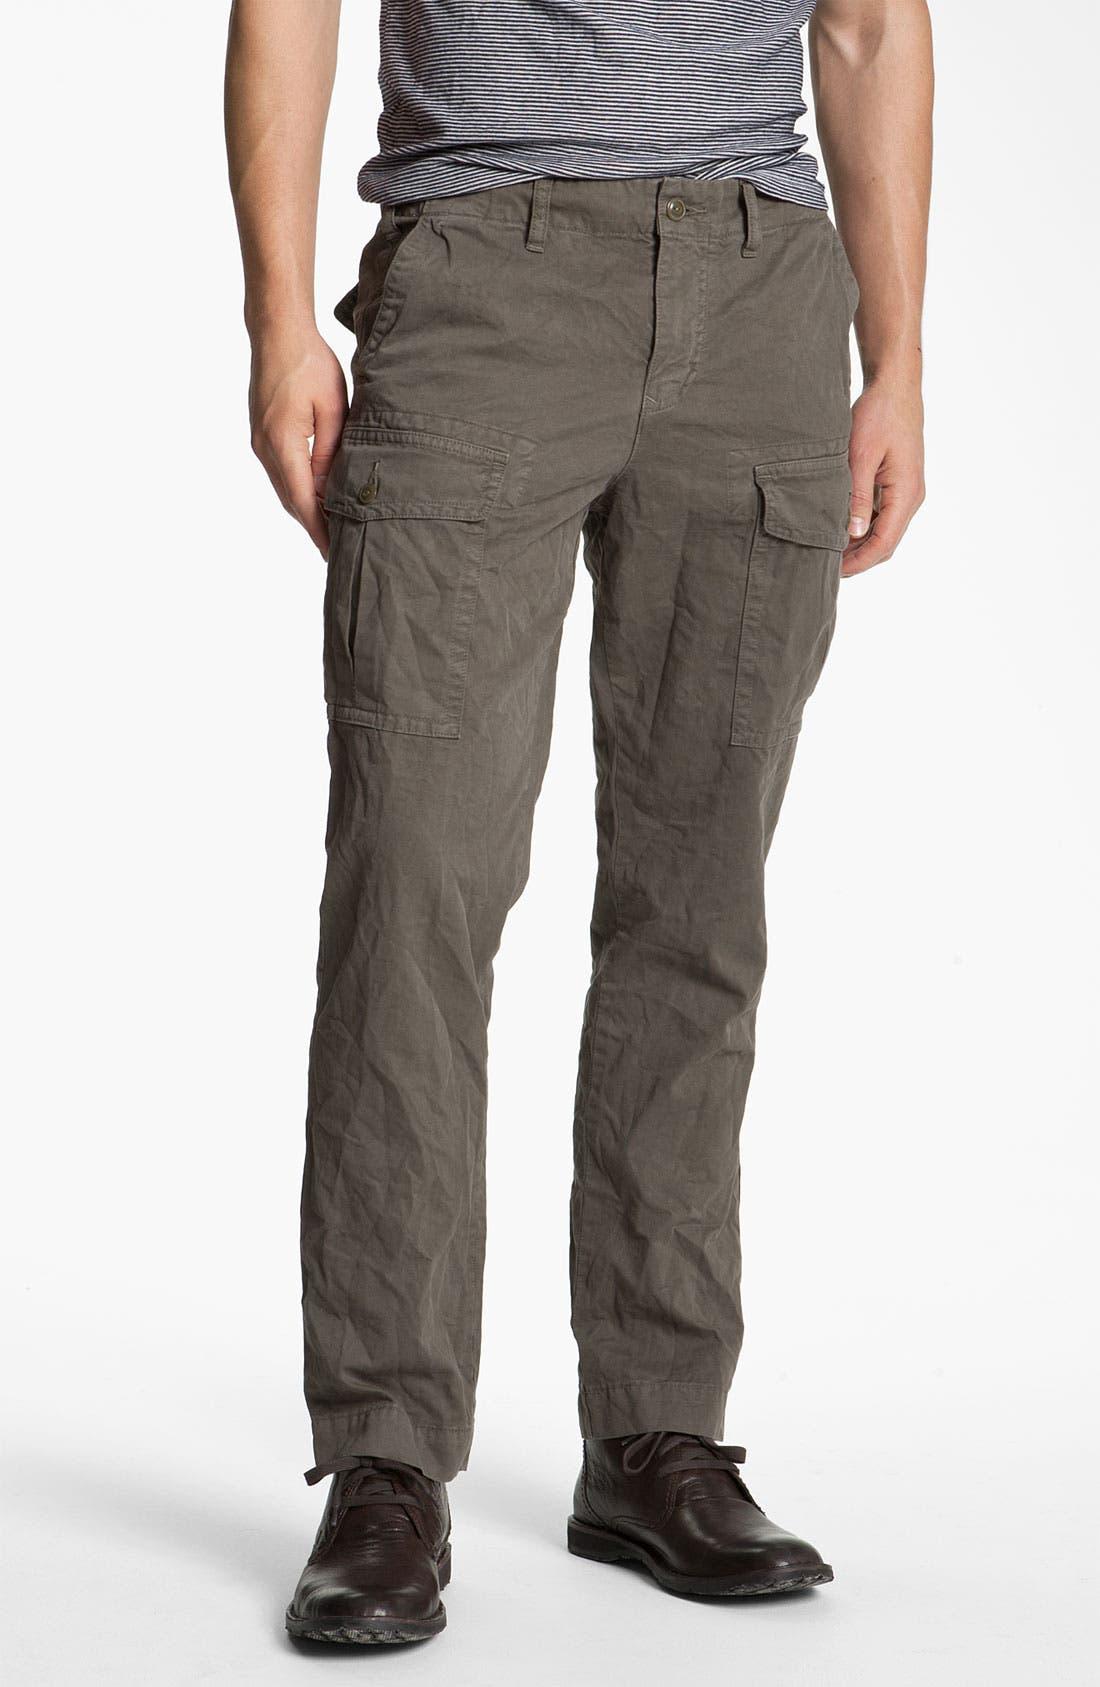 Alternate Image 1 Selected - Save Khaki Cargo Pants